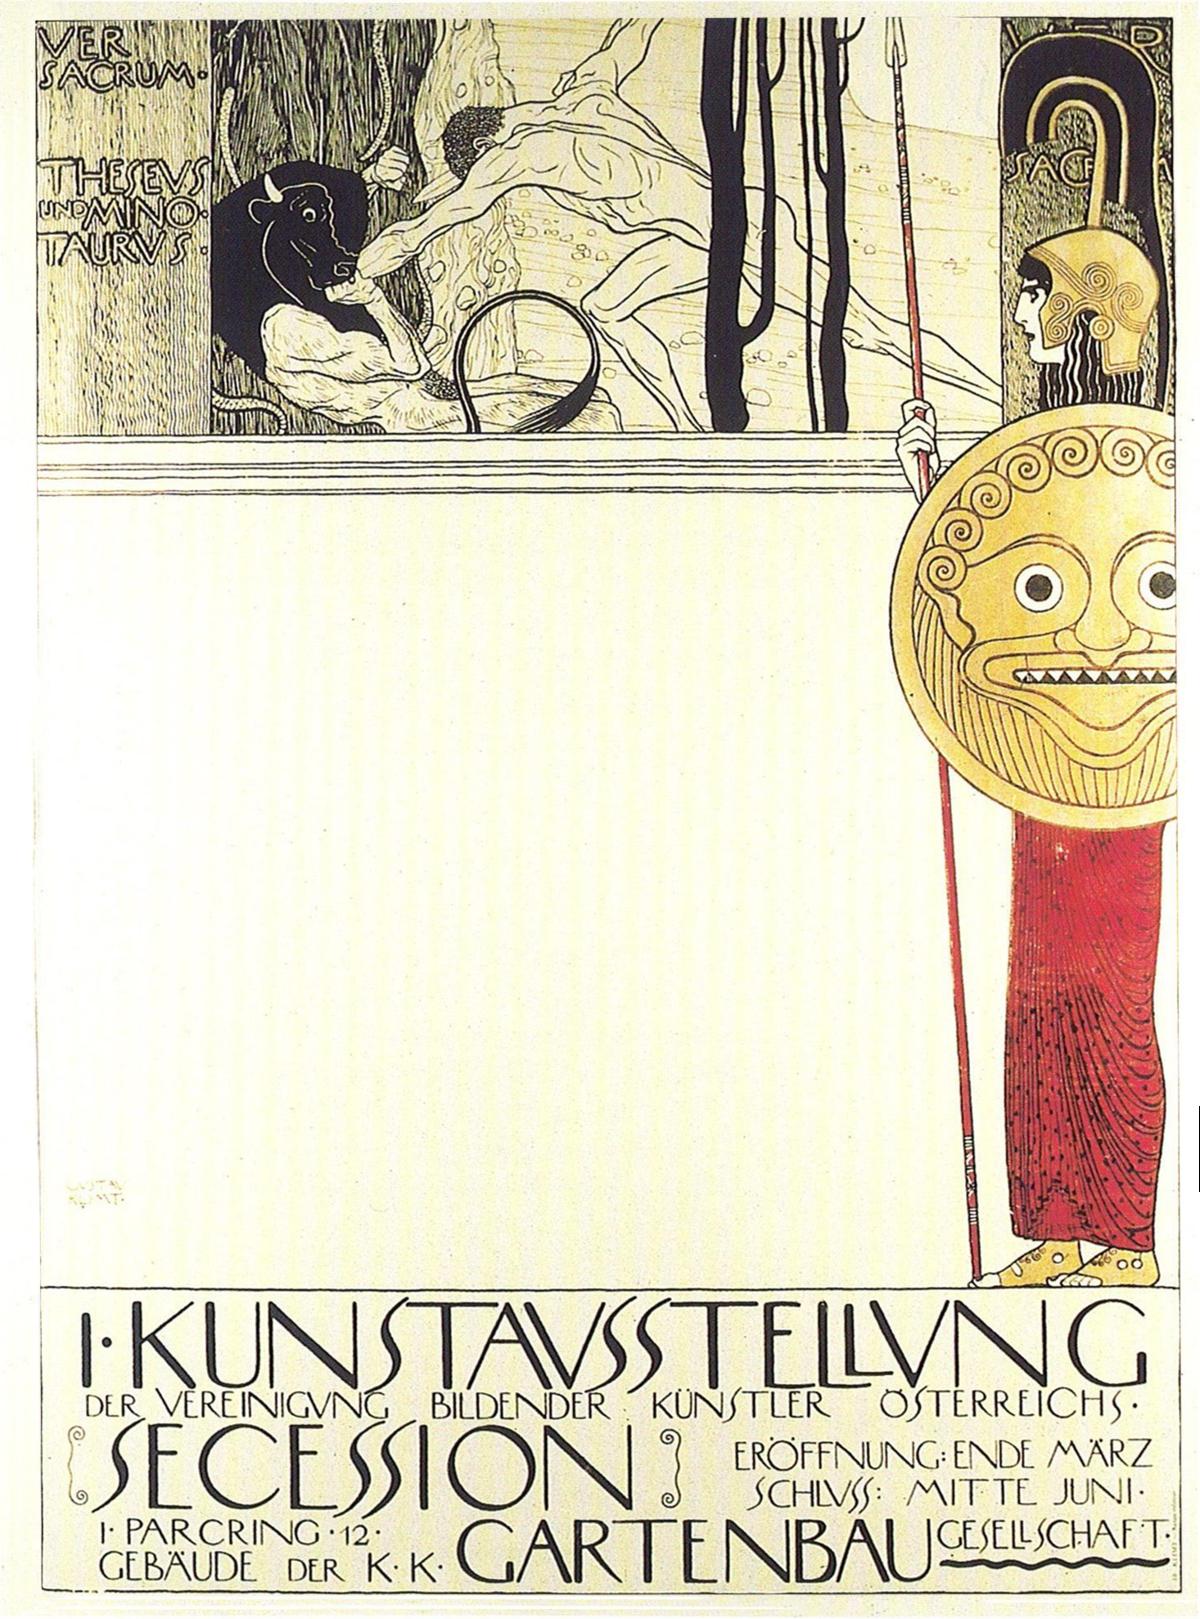 Progetti Pagine Da Colorare Di Gustav Klimt Pravreshcom